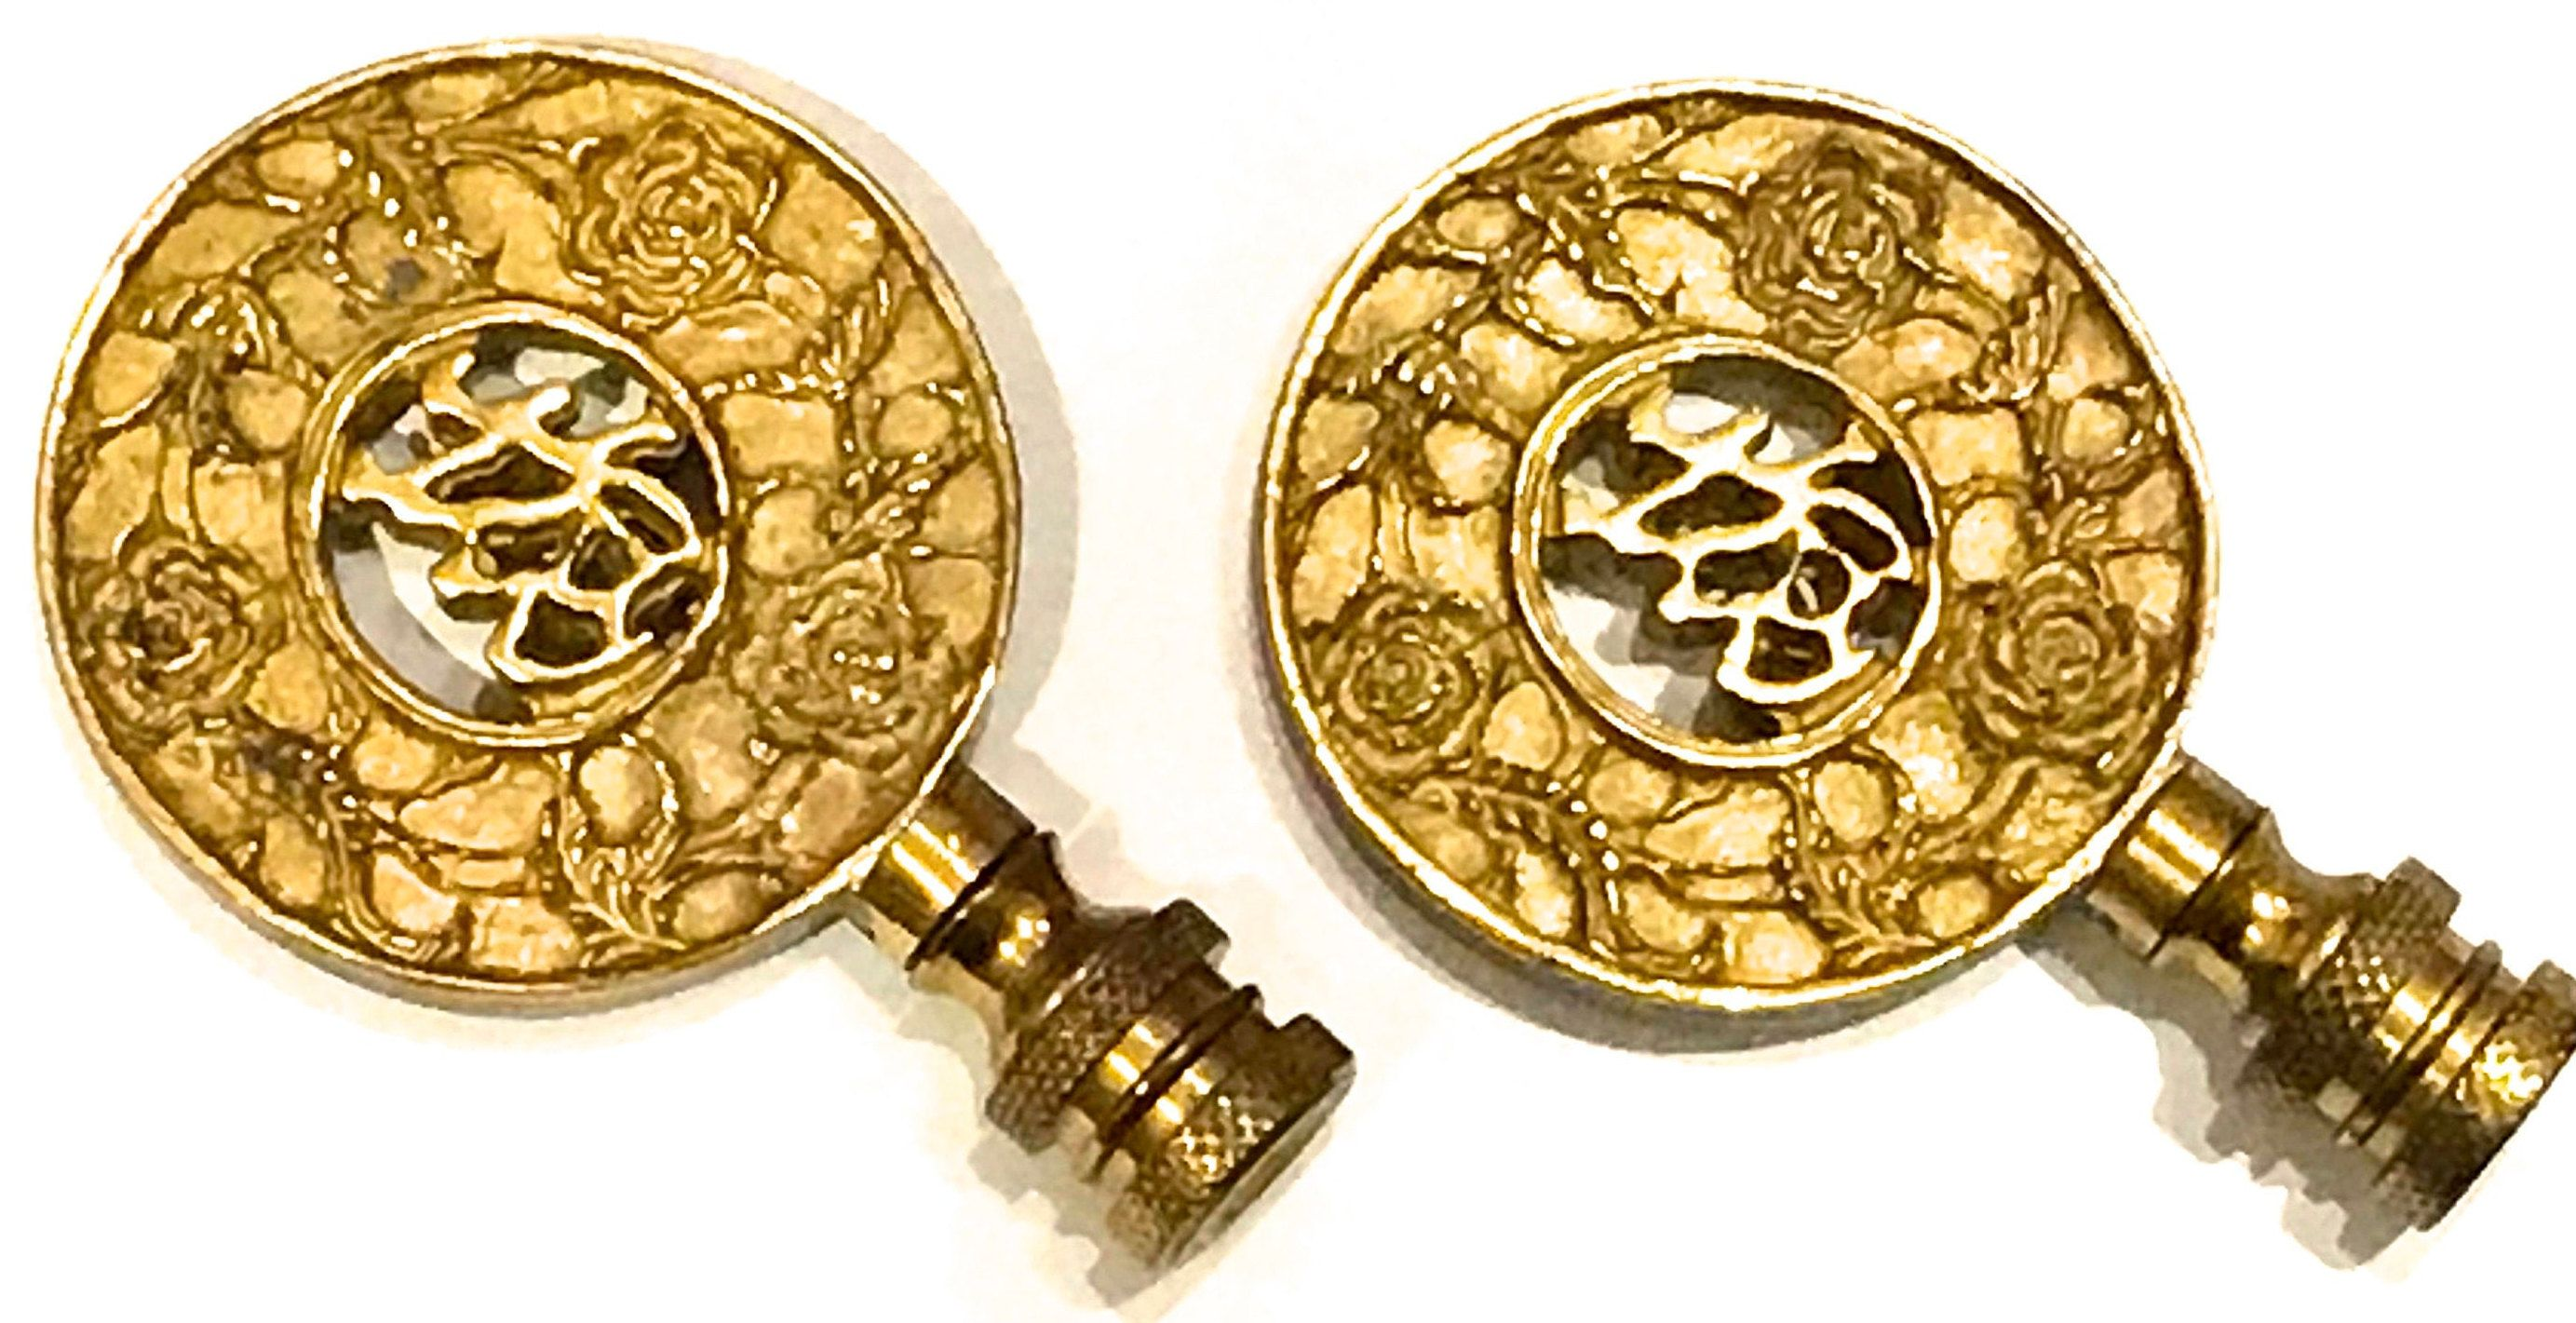 Antique Brass Good Fortune Asian Lamp Finials Oriental Motif Lamp Finials Id Century Decorative Brass Set Of 2 Lamp Finial Asian Lamps Finials